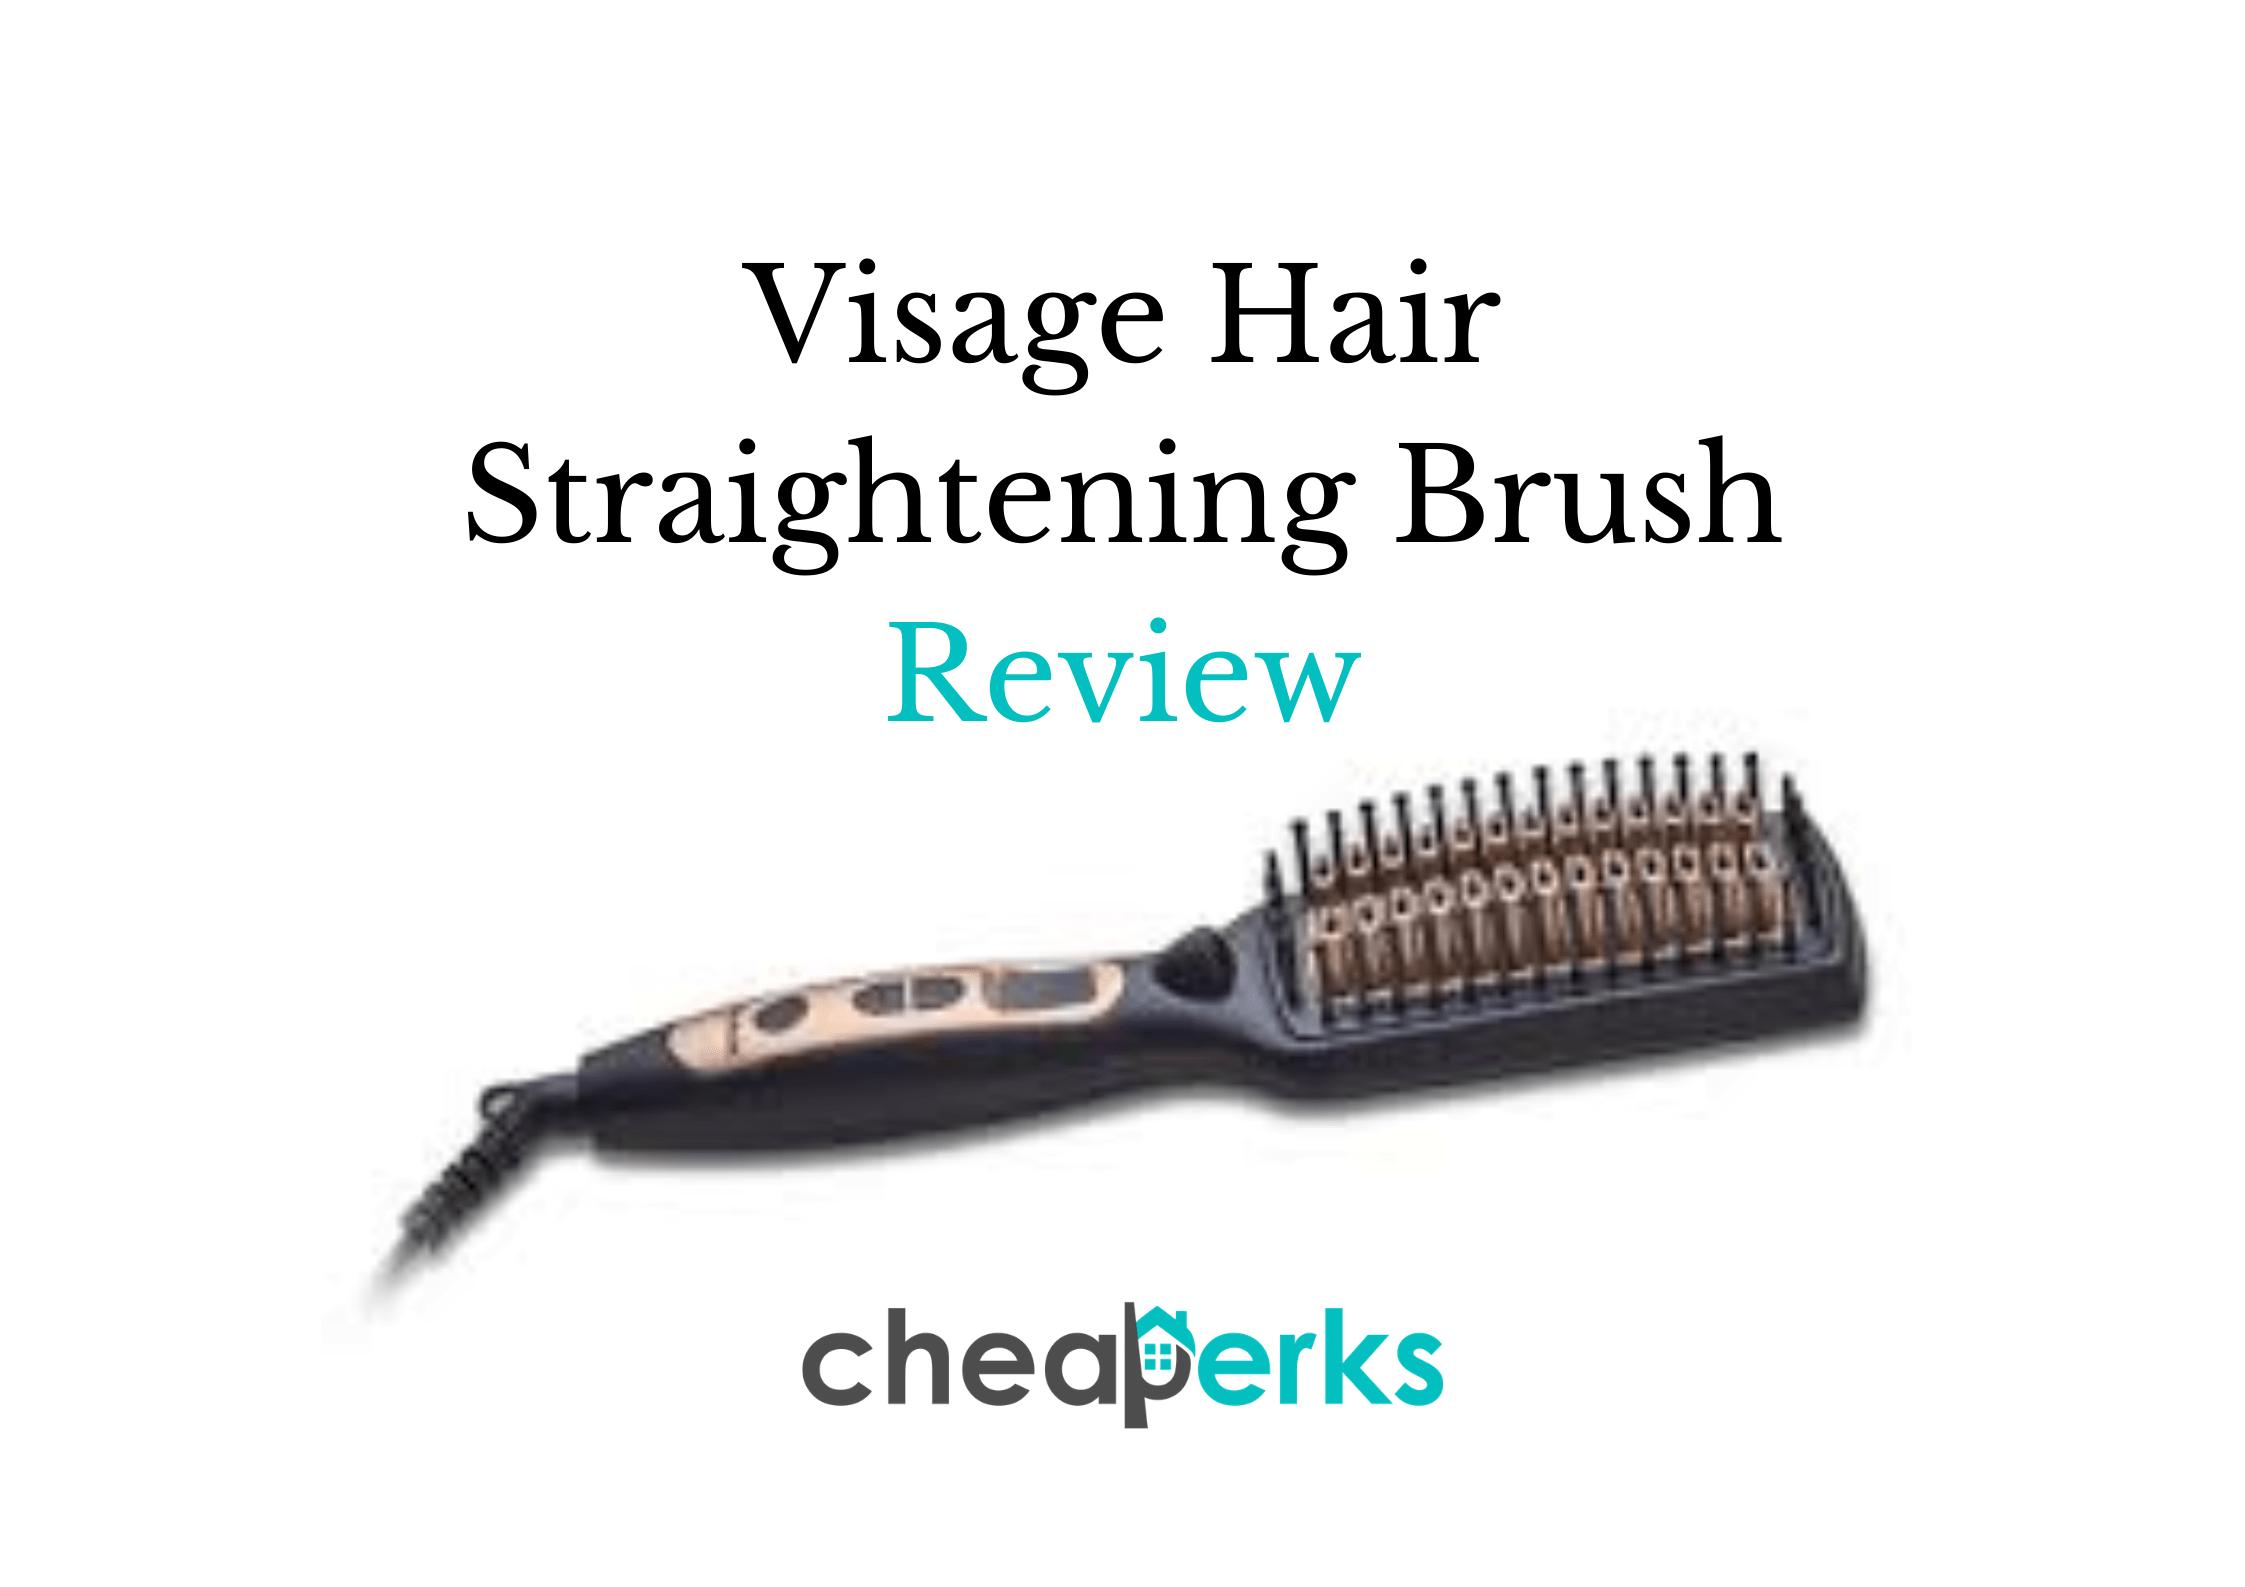 Visage Hair Straightening Brush Review